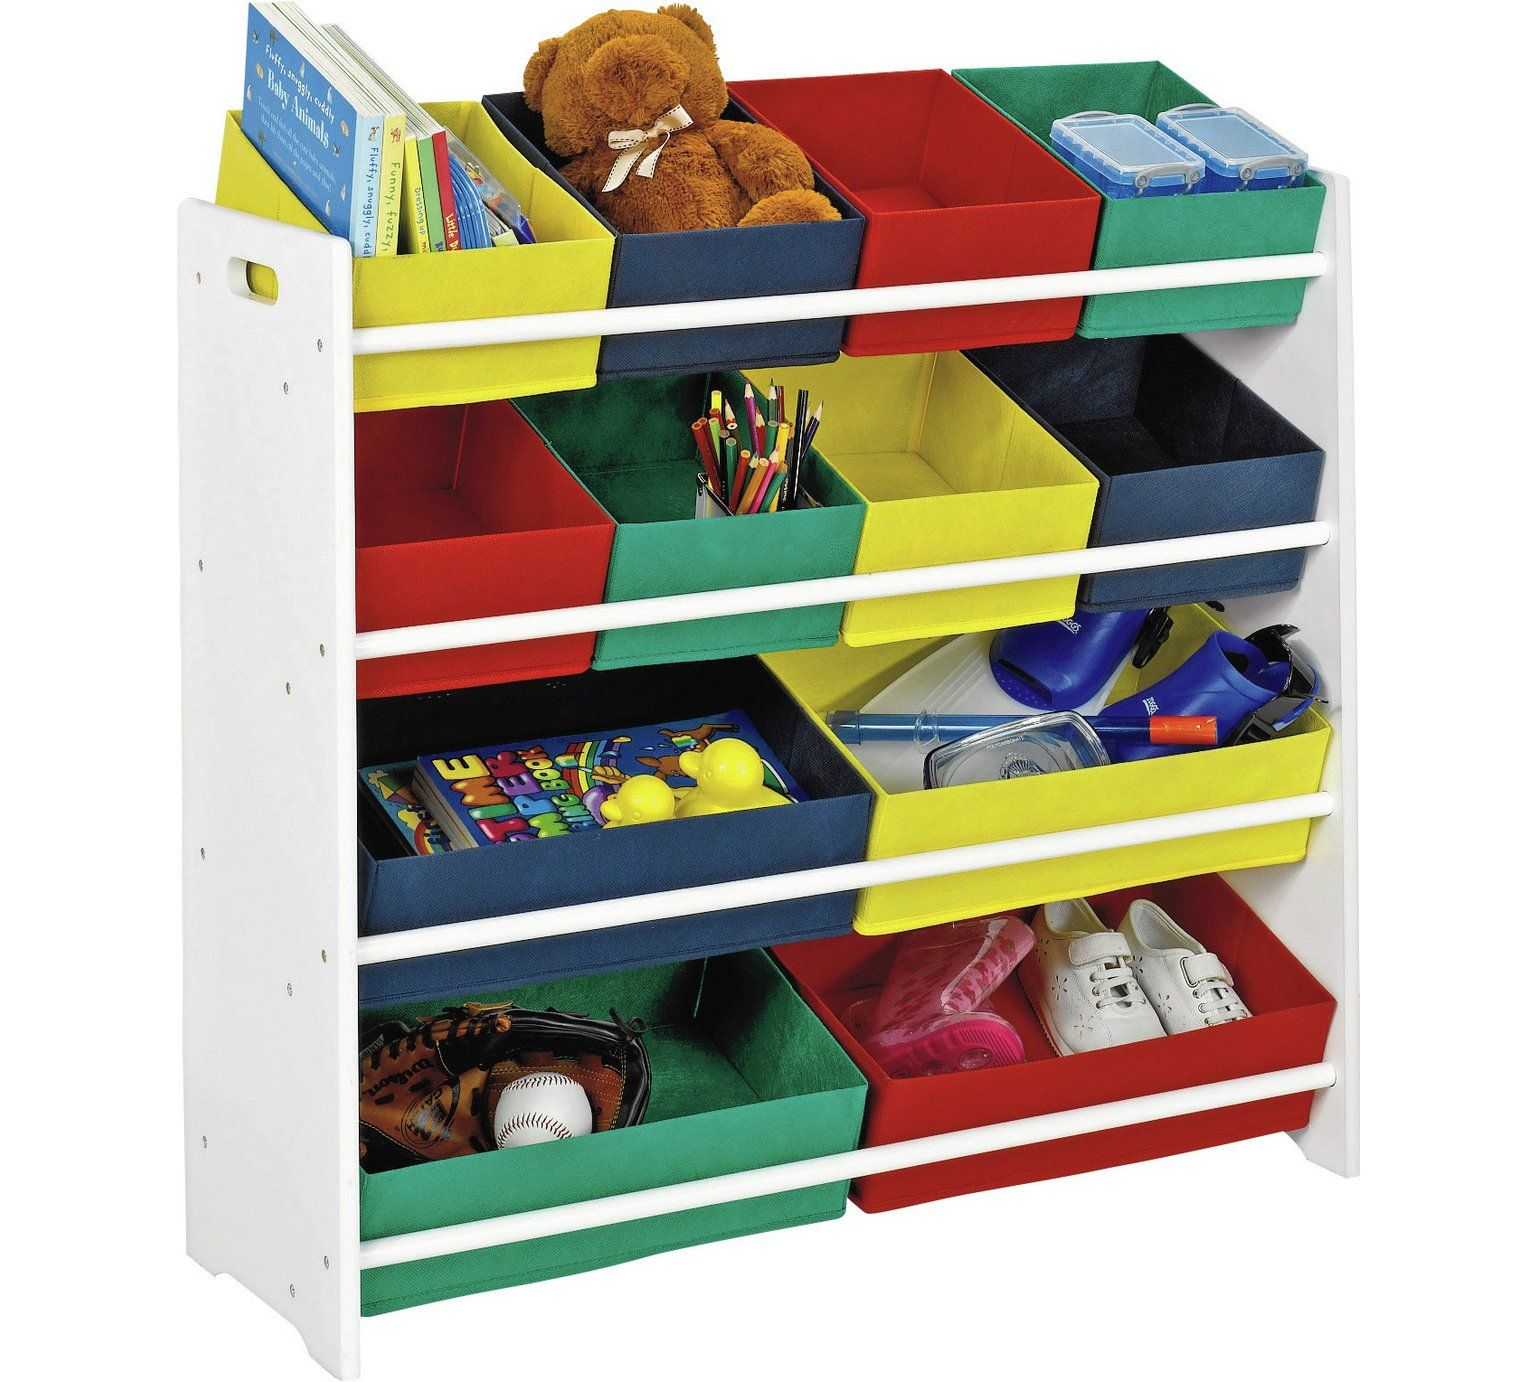 Buy argos home 4 tier kids basket storage unit with bins